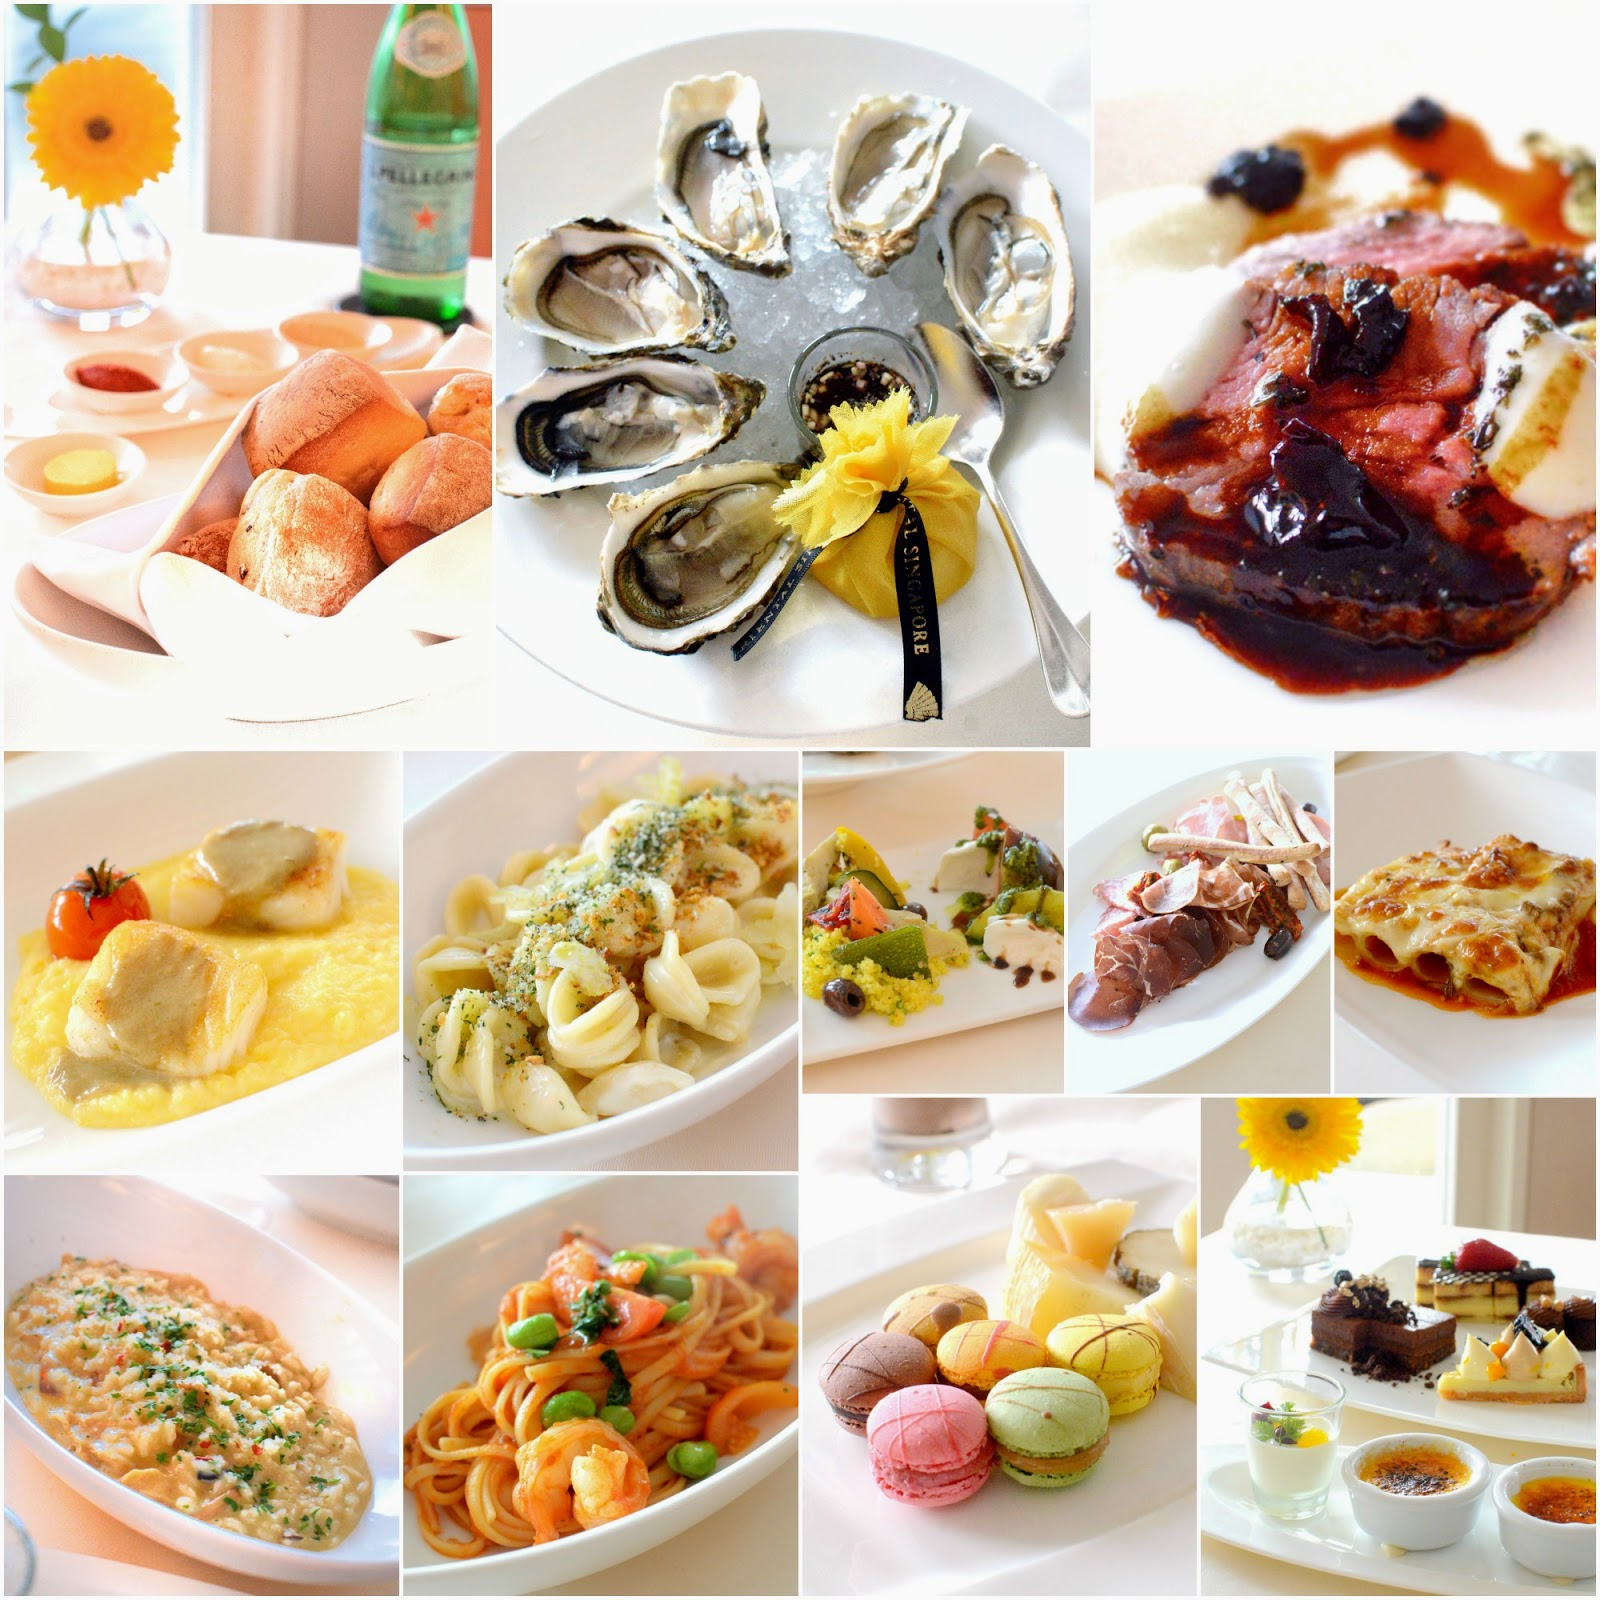 http://www.chocolatemuimui.com/2015/04/mandarin-oriental-singapore-dolce-vita.html